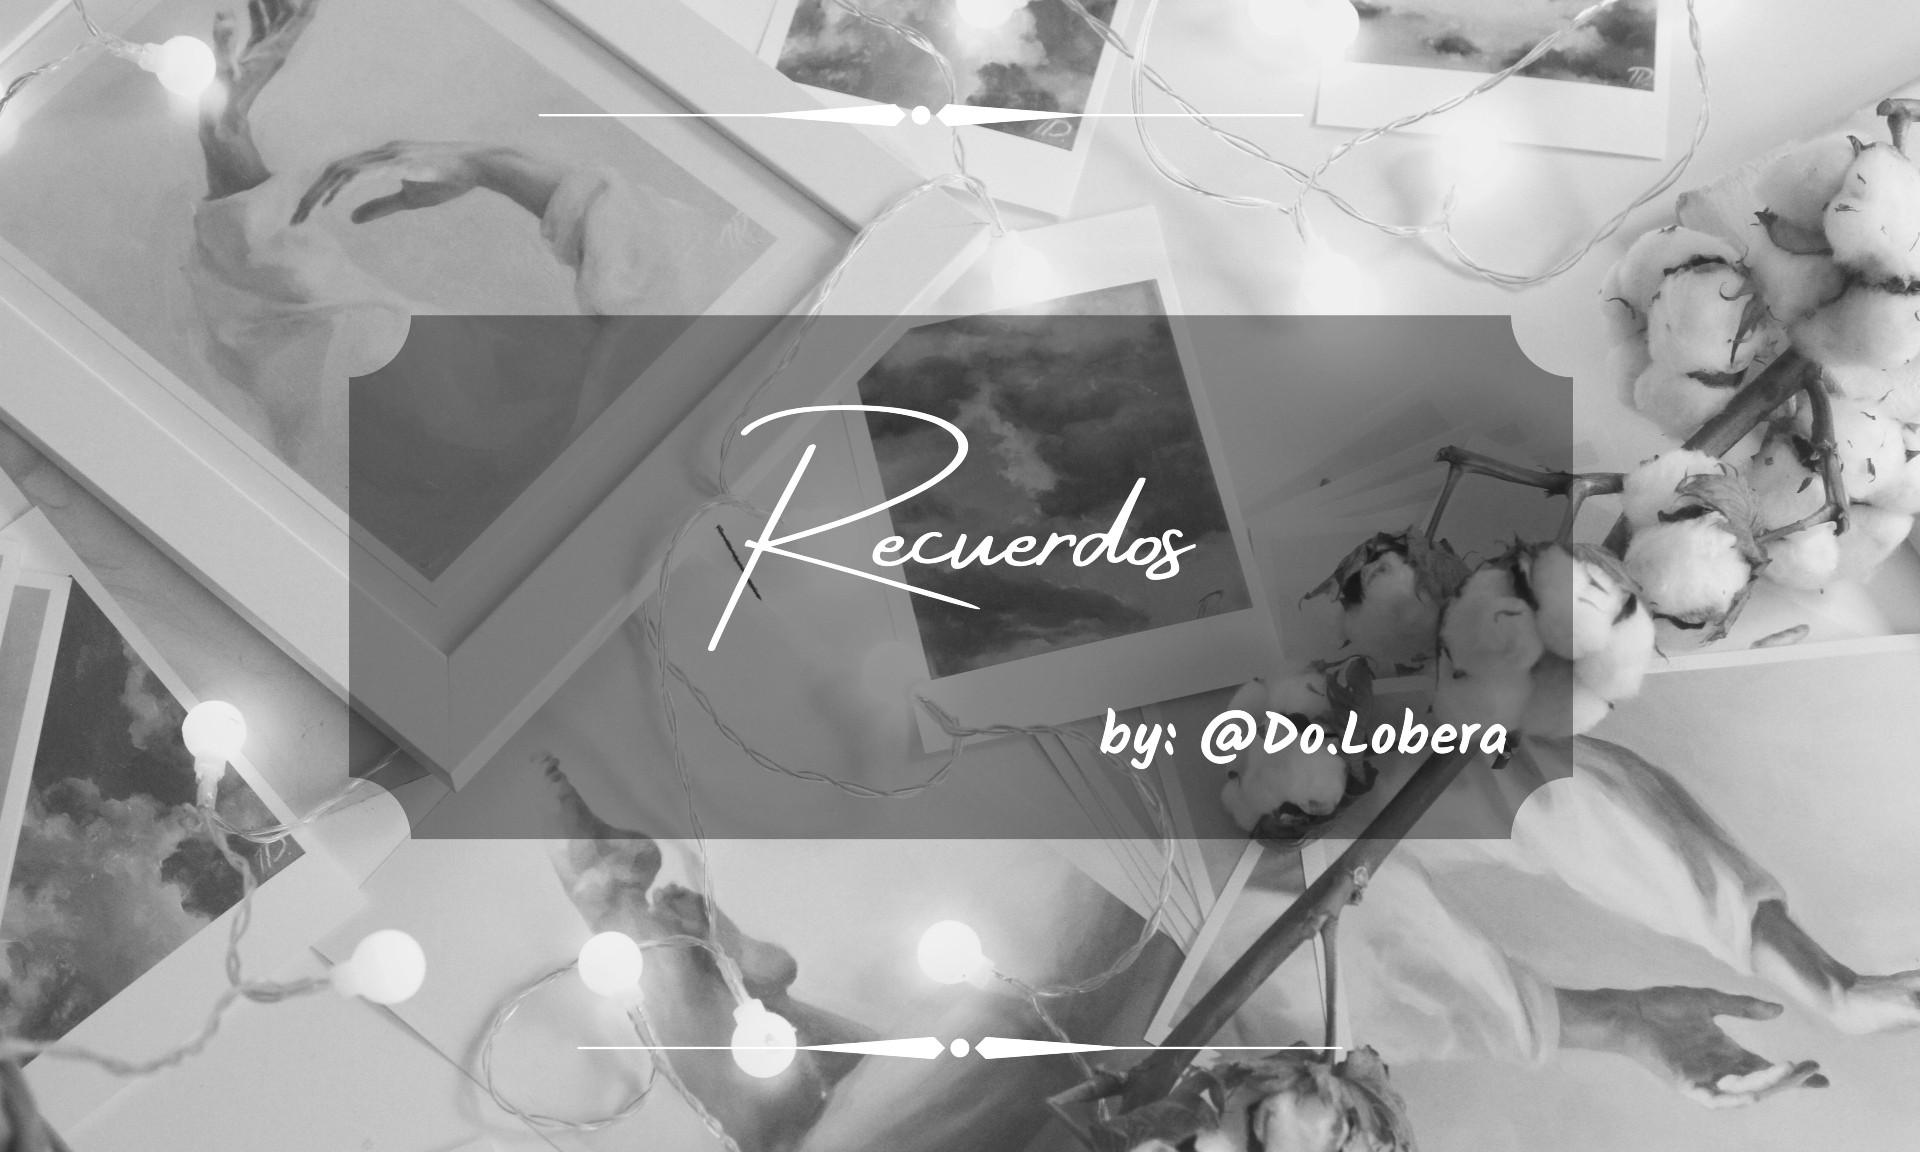 Recuerdos - by Do.lobera